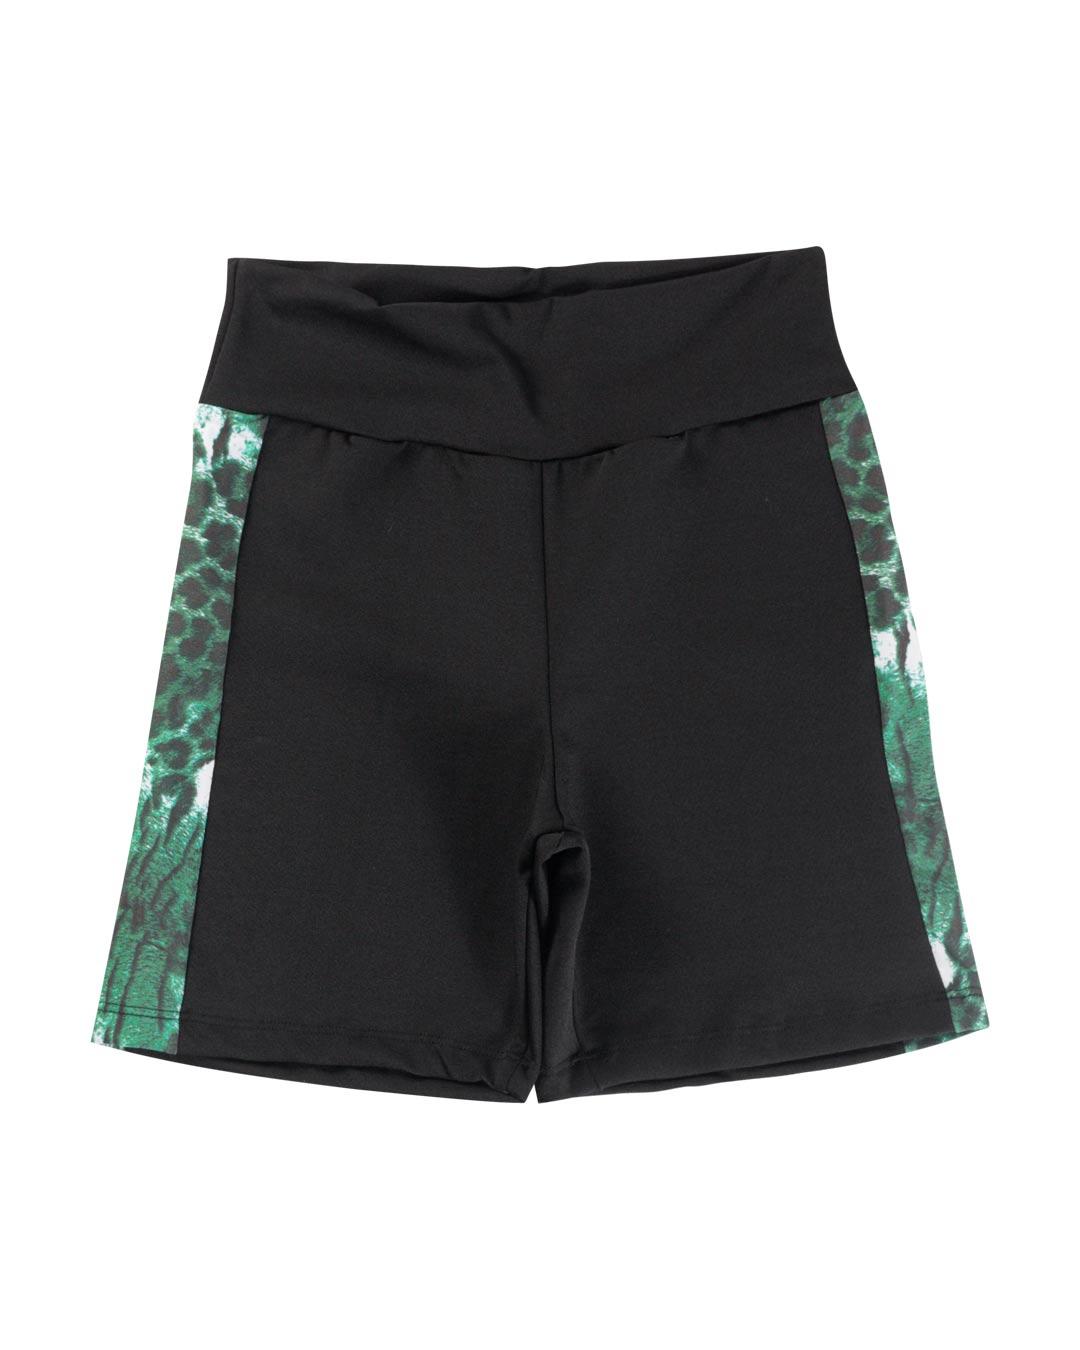 Shorts Fitness Preto Com Barra Lateral Estampa Onça Verde - Movimente-se